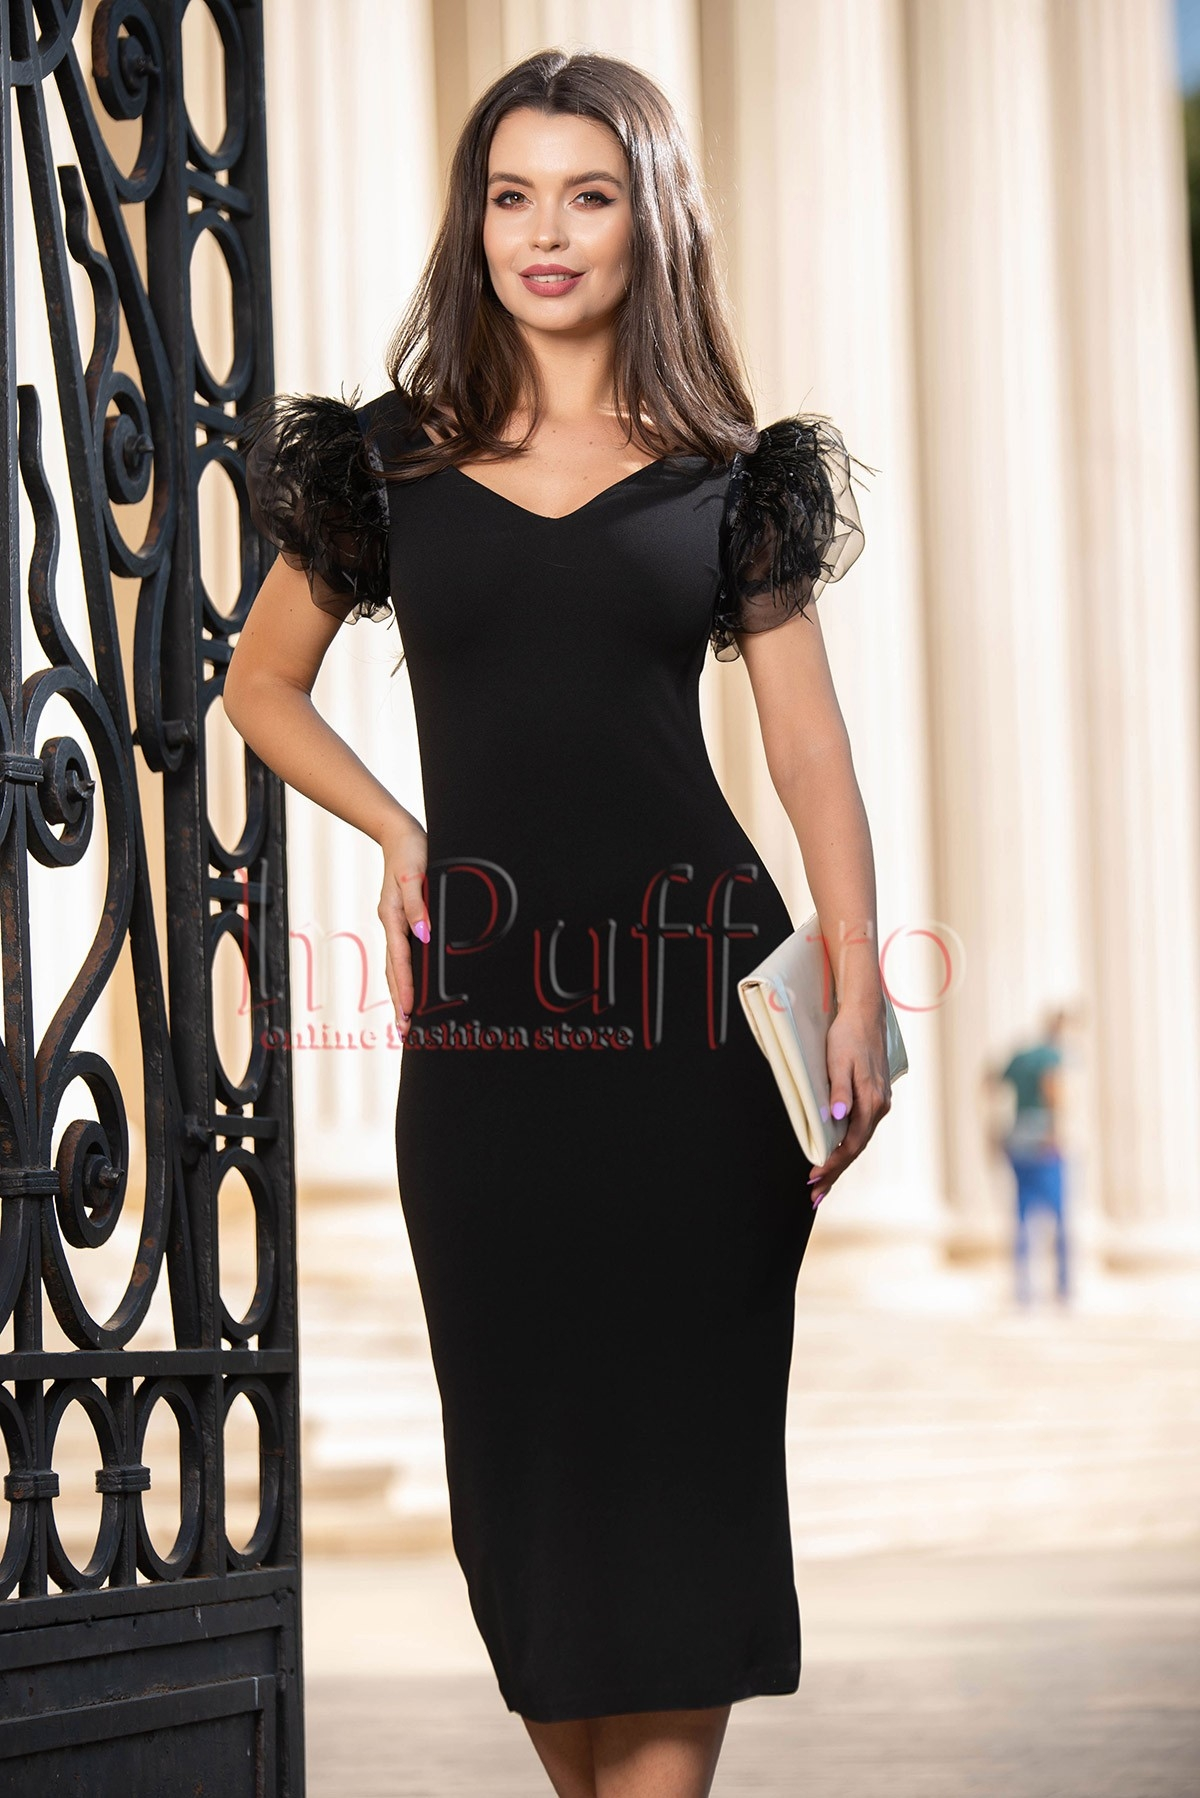 Rochie neagra eleganta cu maneci din tul deosebite